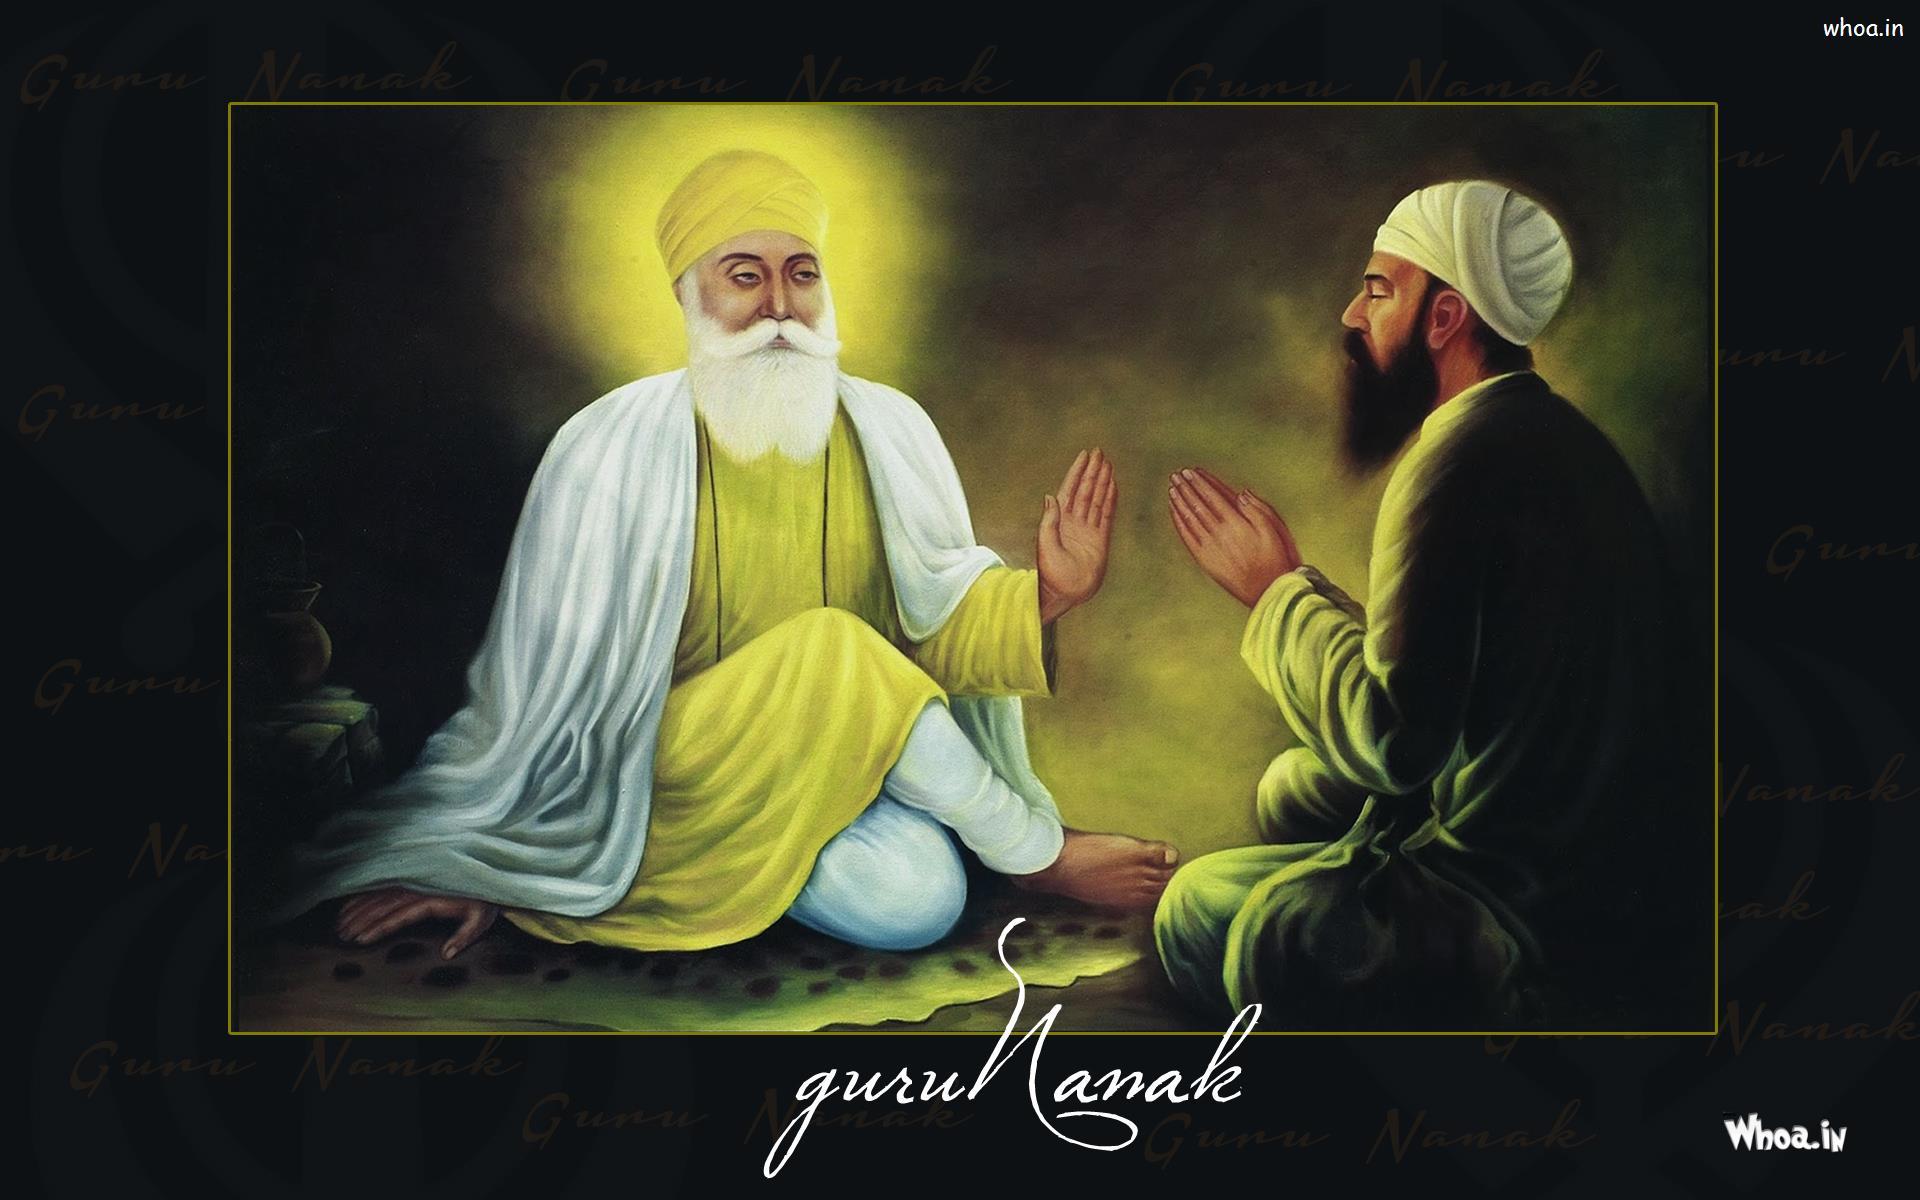 Must see Wallpaper High Resolution Sikh - Pmh1yb  Trends_81521.jpg